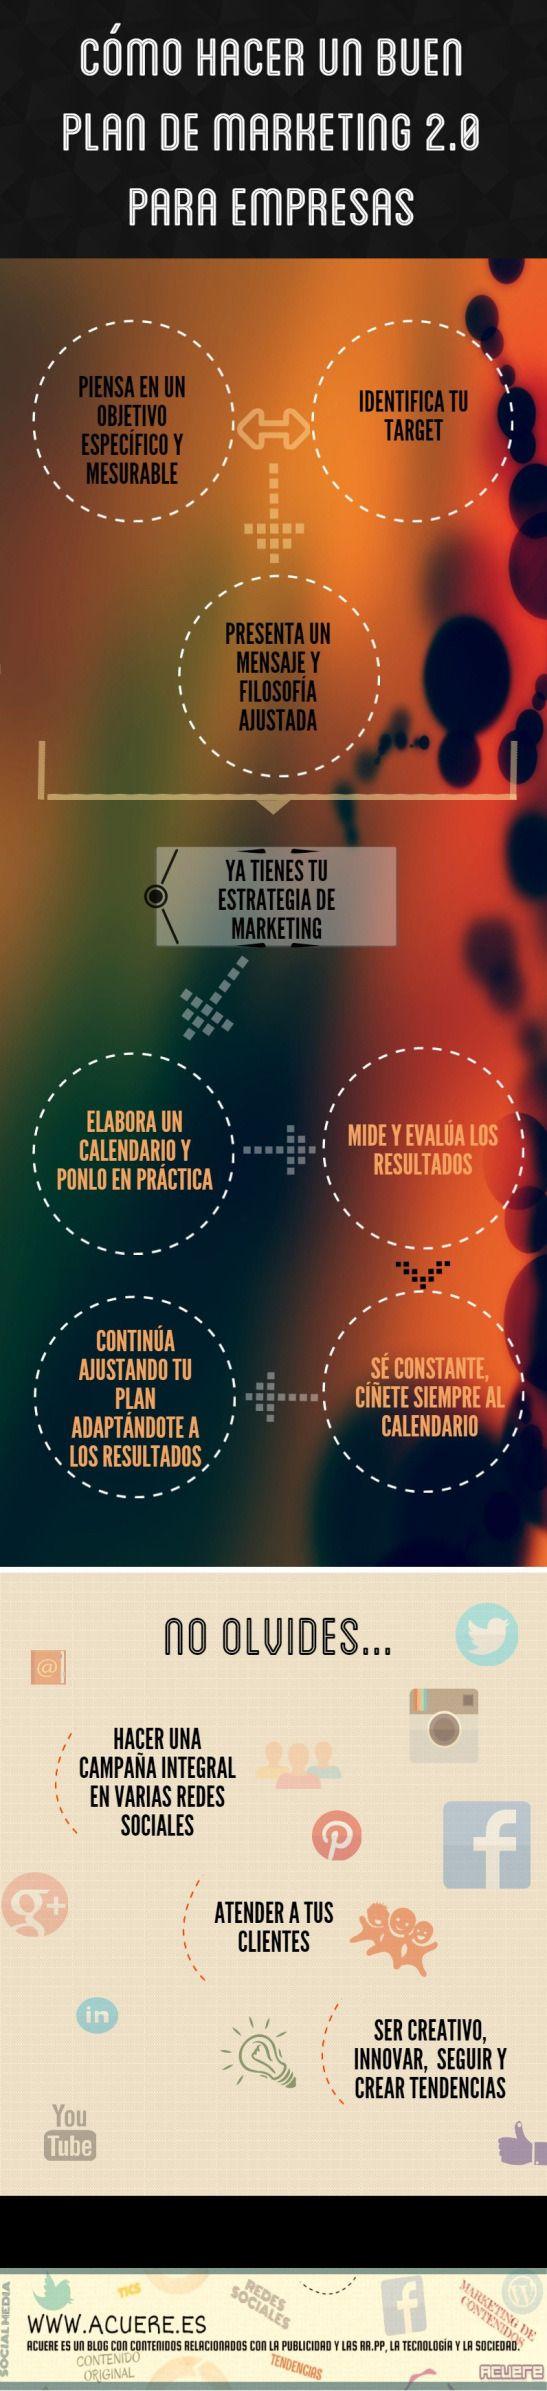 Plan de marketing 2.0 para empresas #infografia :: GrupoEclipse.net